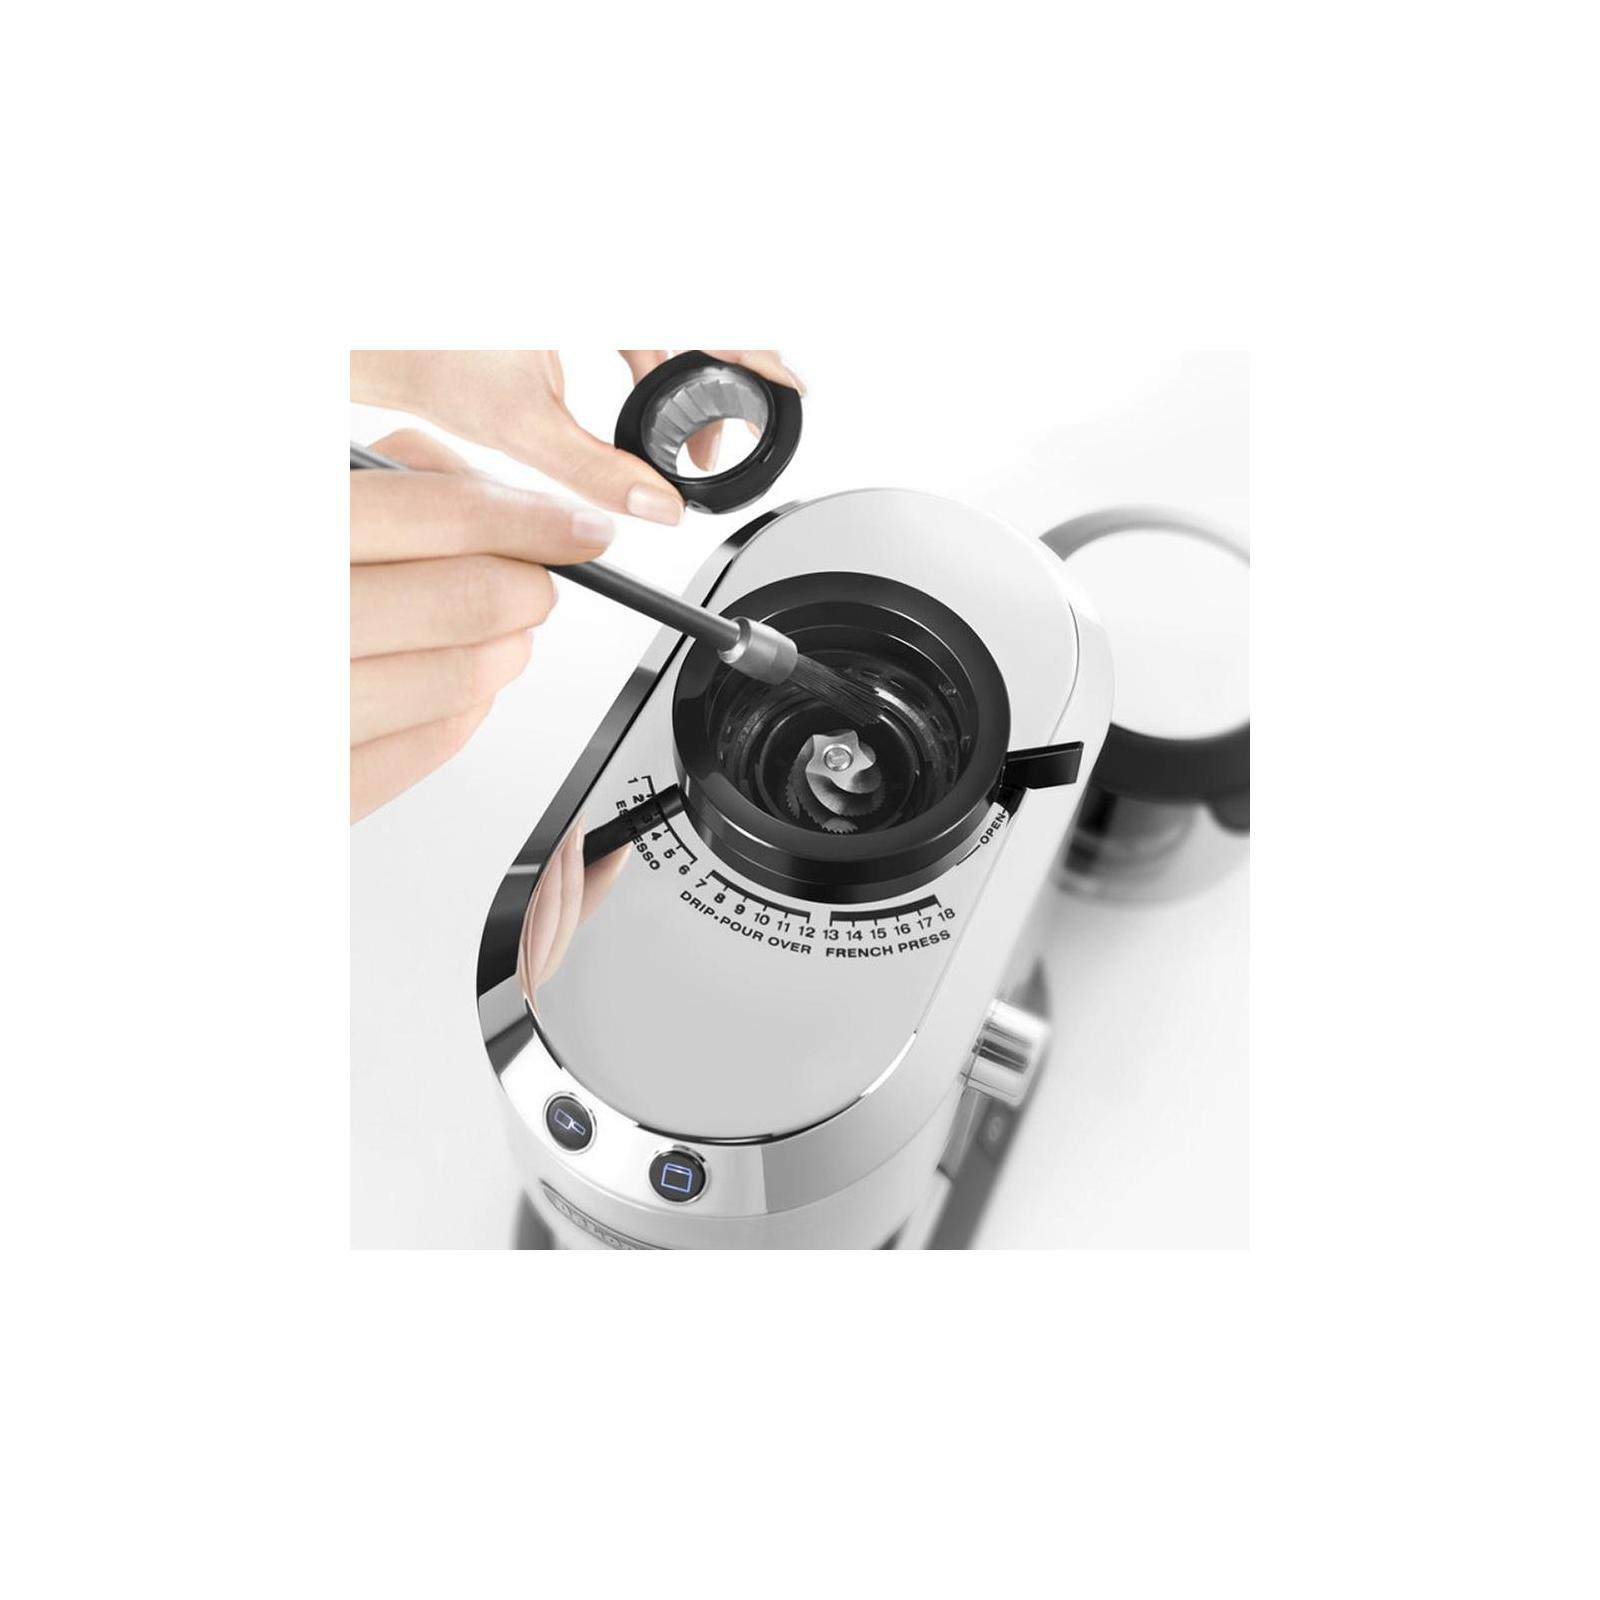 Кофемолка DeLonghi KG 520 M изображение 3